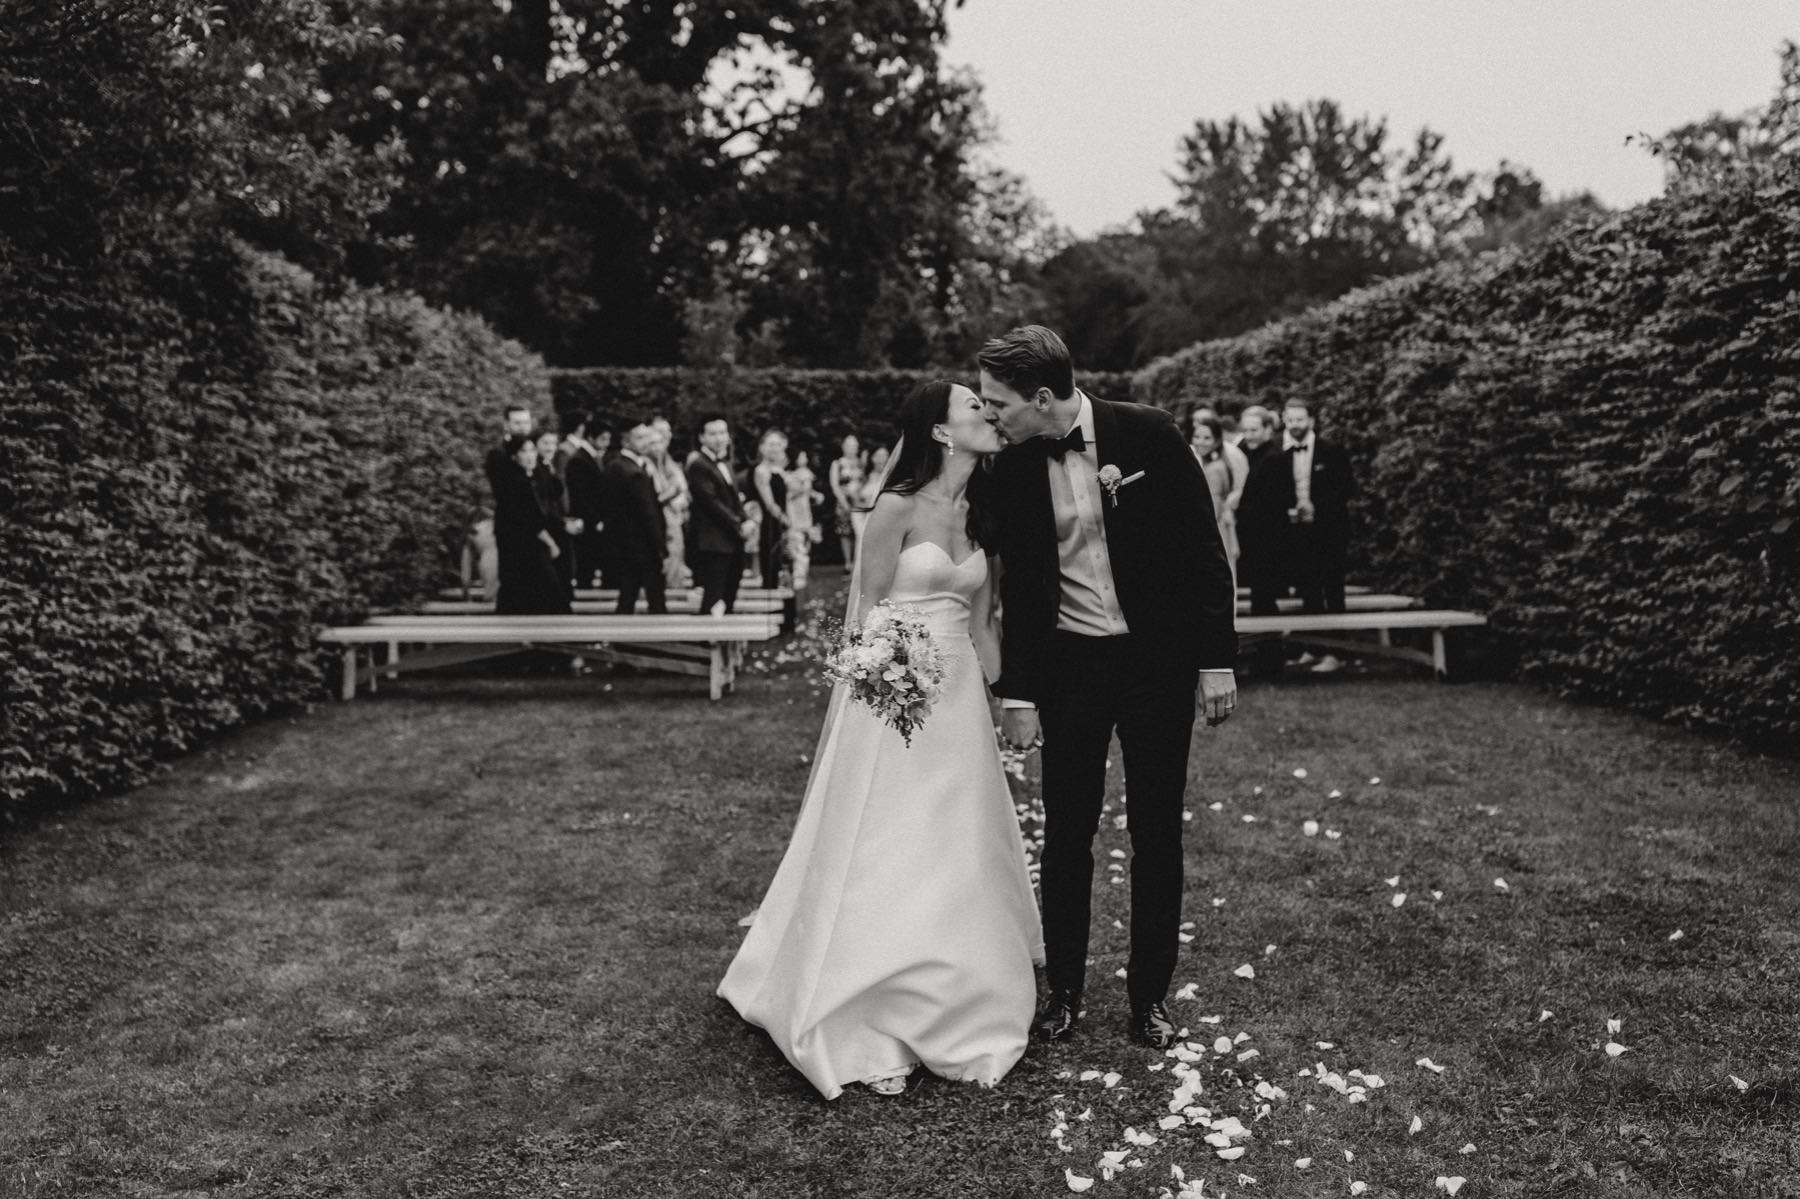 Rosendals Trädgård secret garden wedding